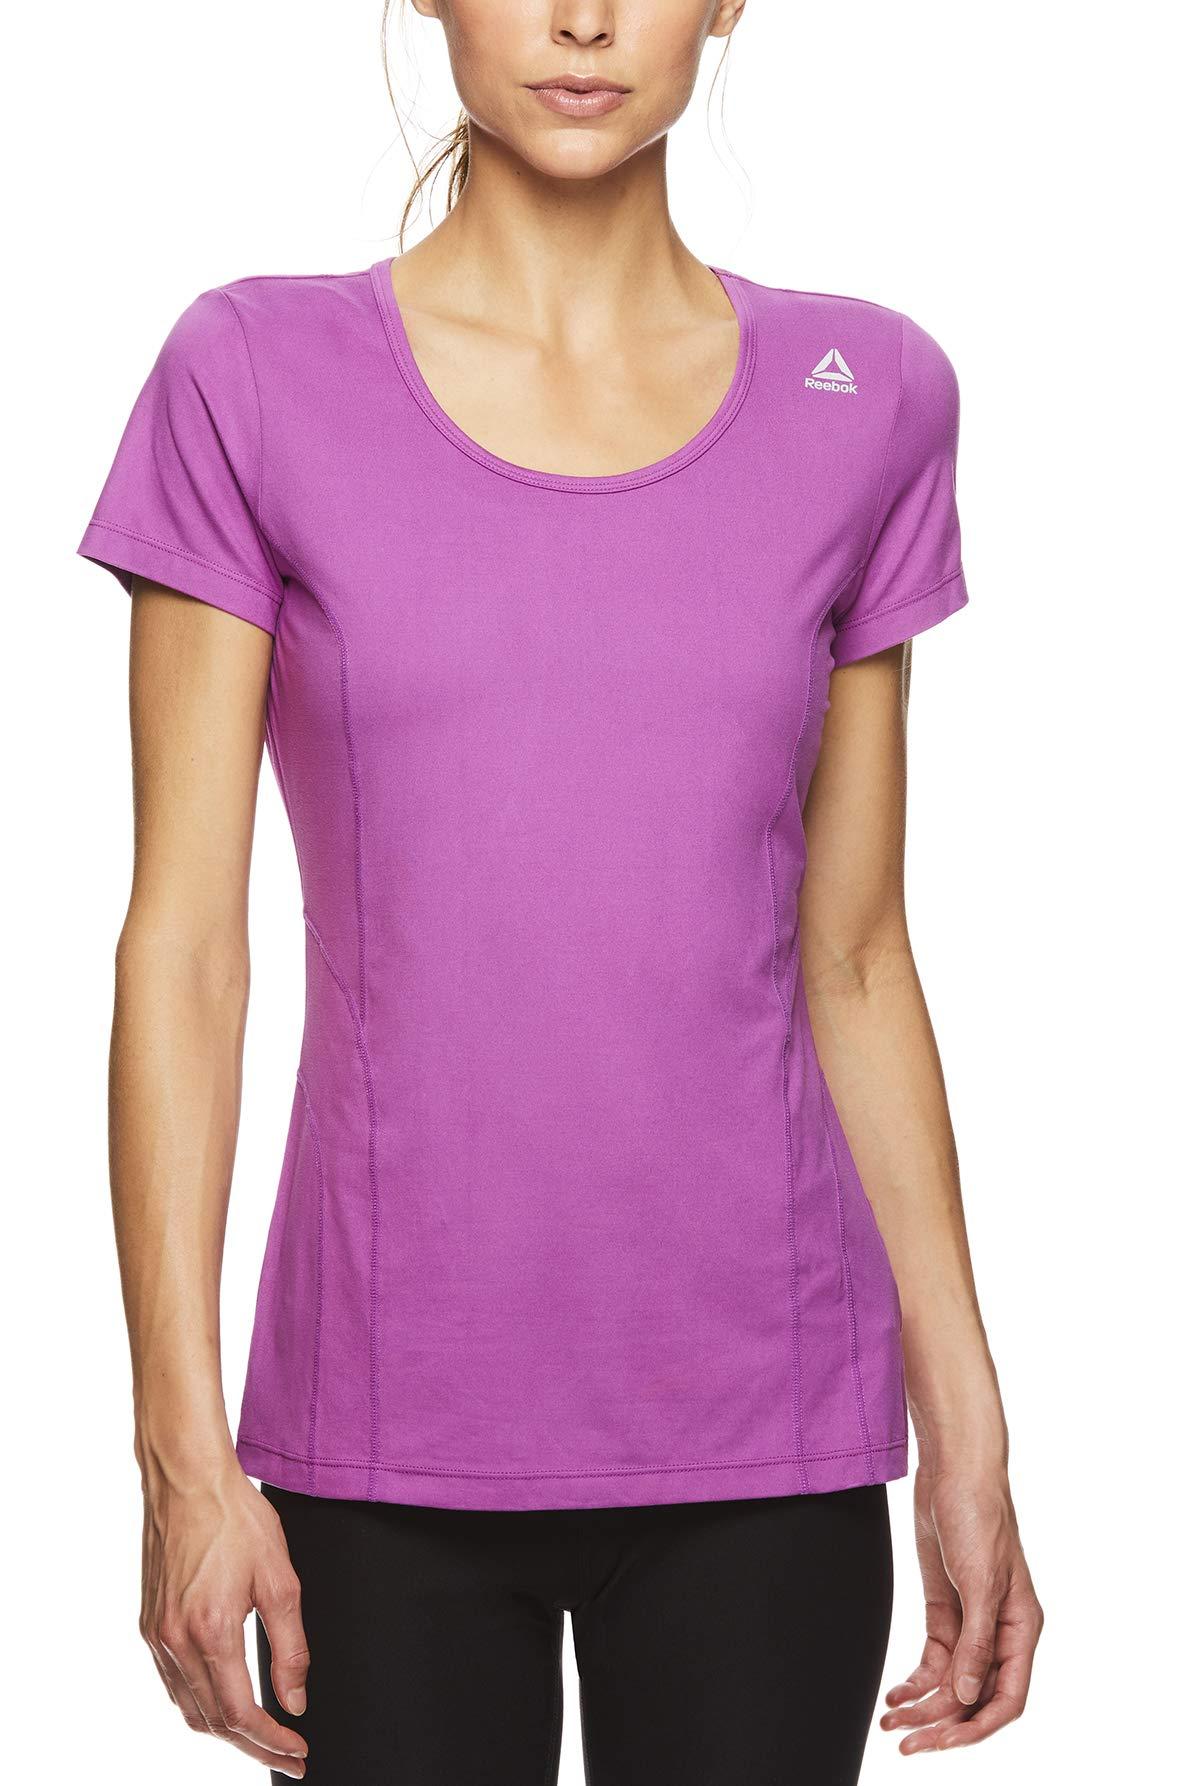 Reebok Womens Dynamic Performance T Shirt